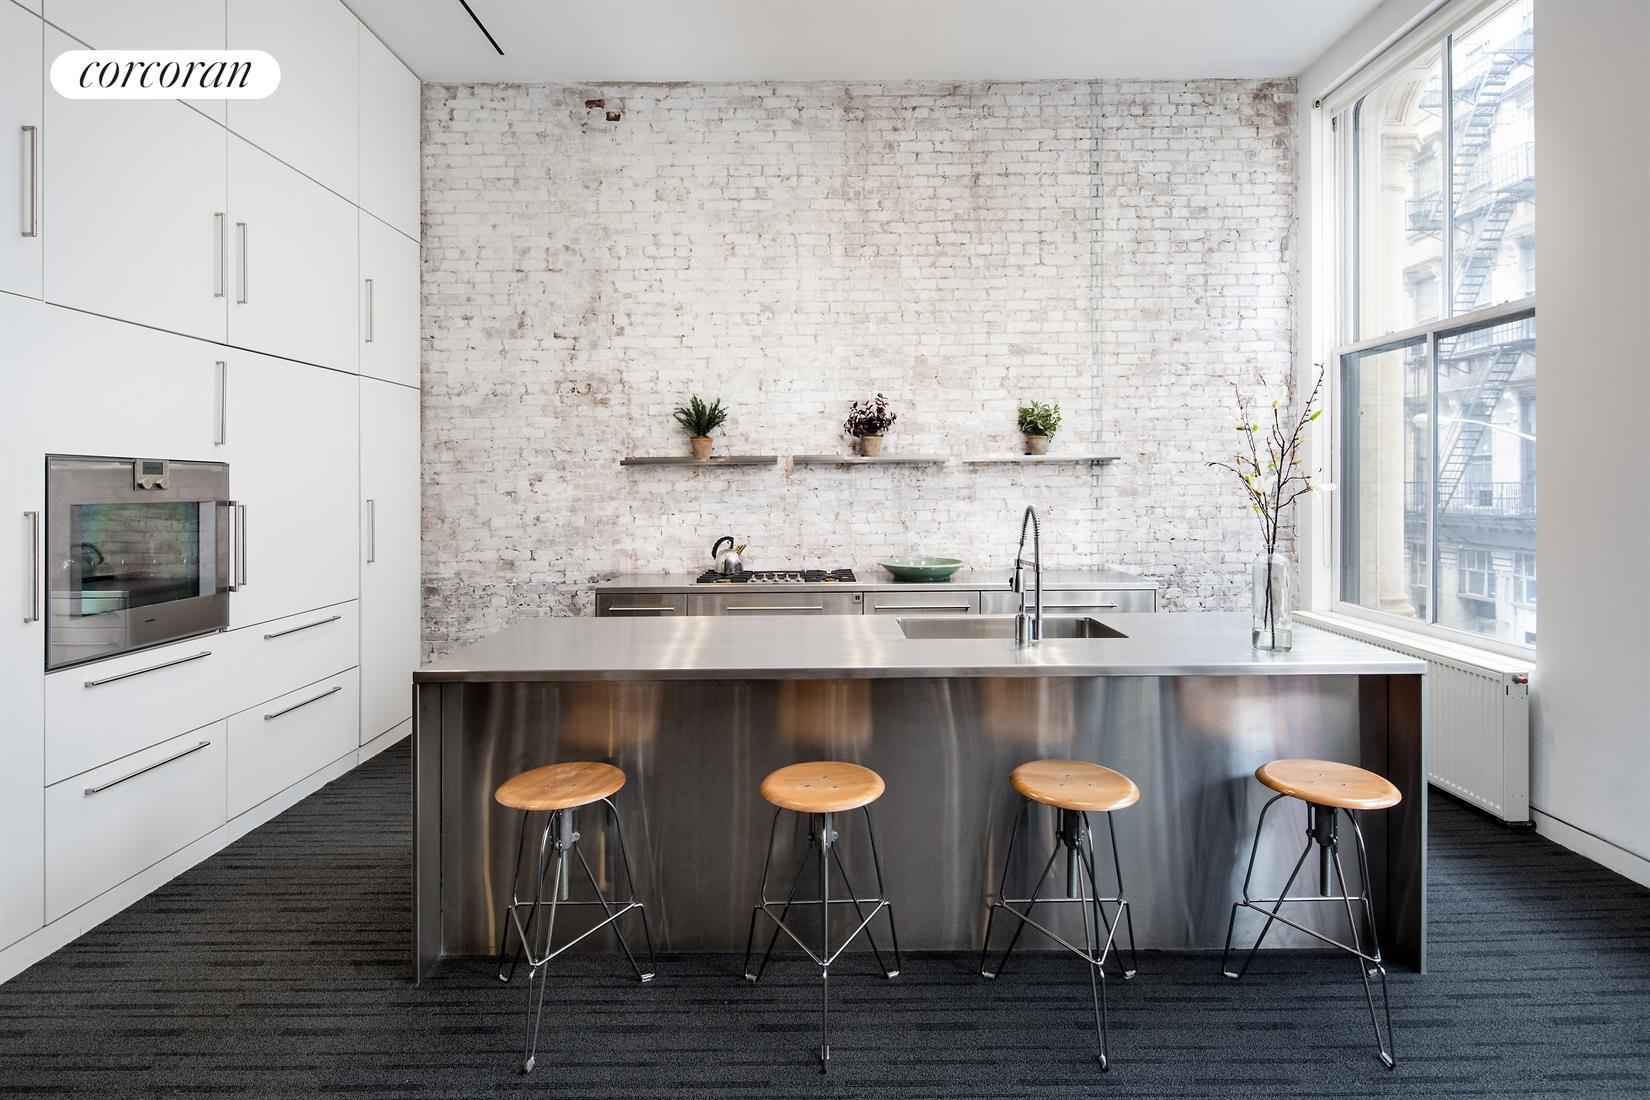 Corcoran, 46 White Street, Apt. 2, Tribeca Real Estate, Manhattan ...